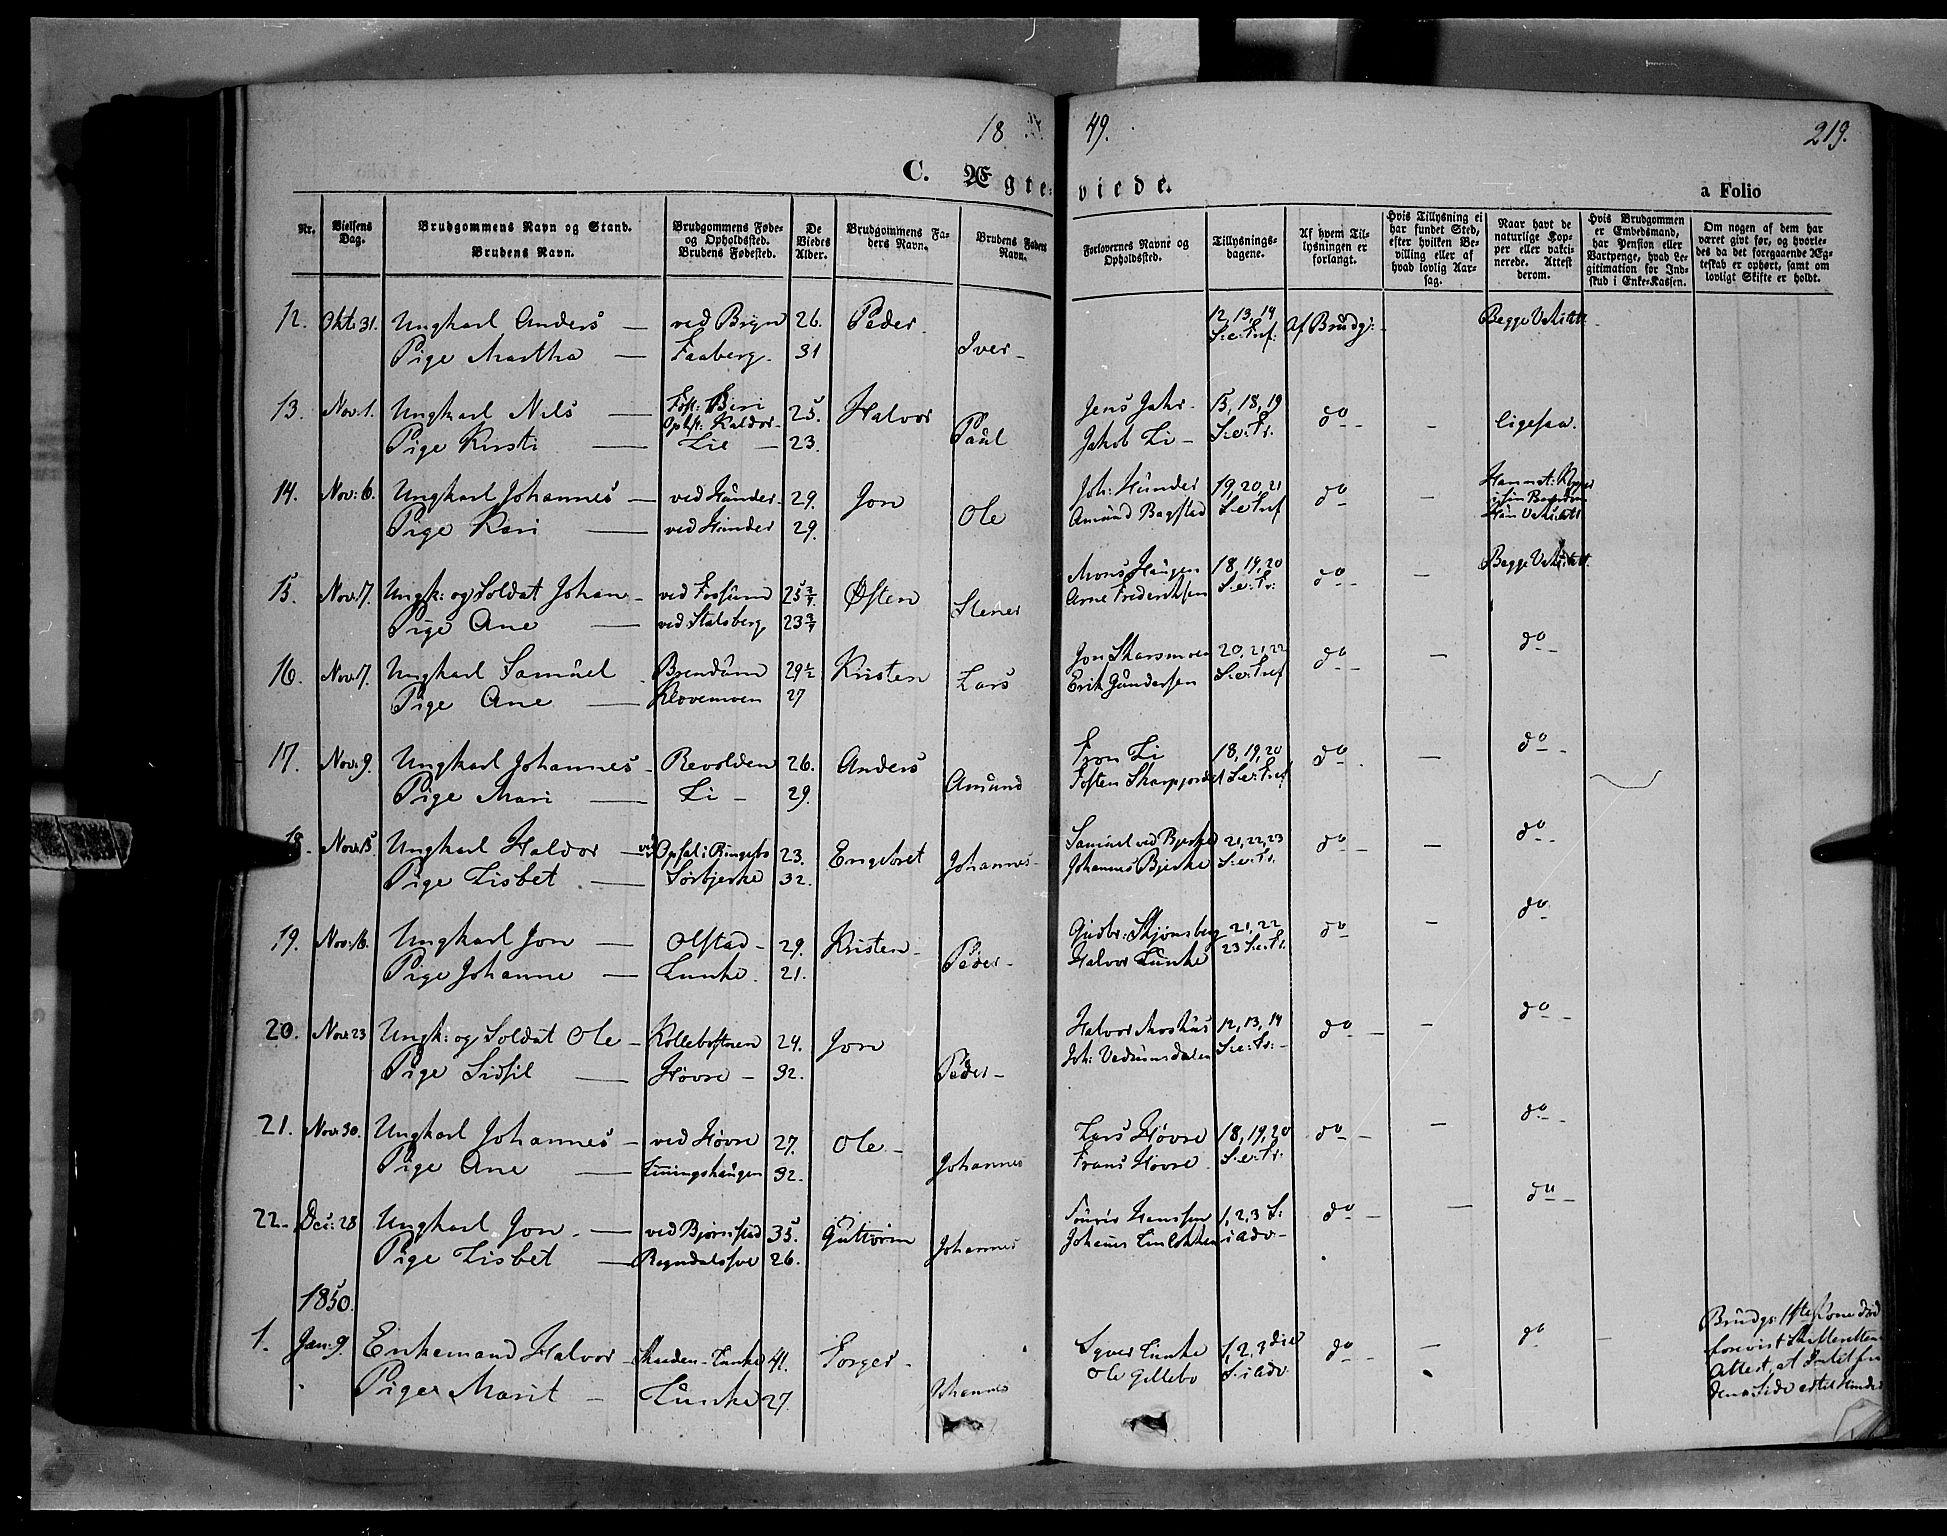 SAH, Øyer prestekontor, Ministerialbok nr. 5, 1842-1857, s. 219